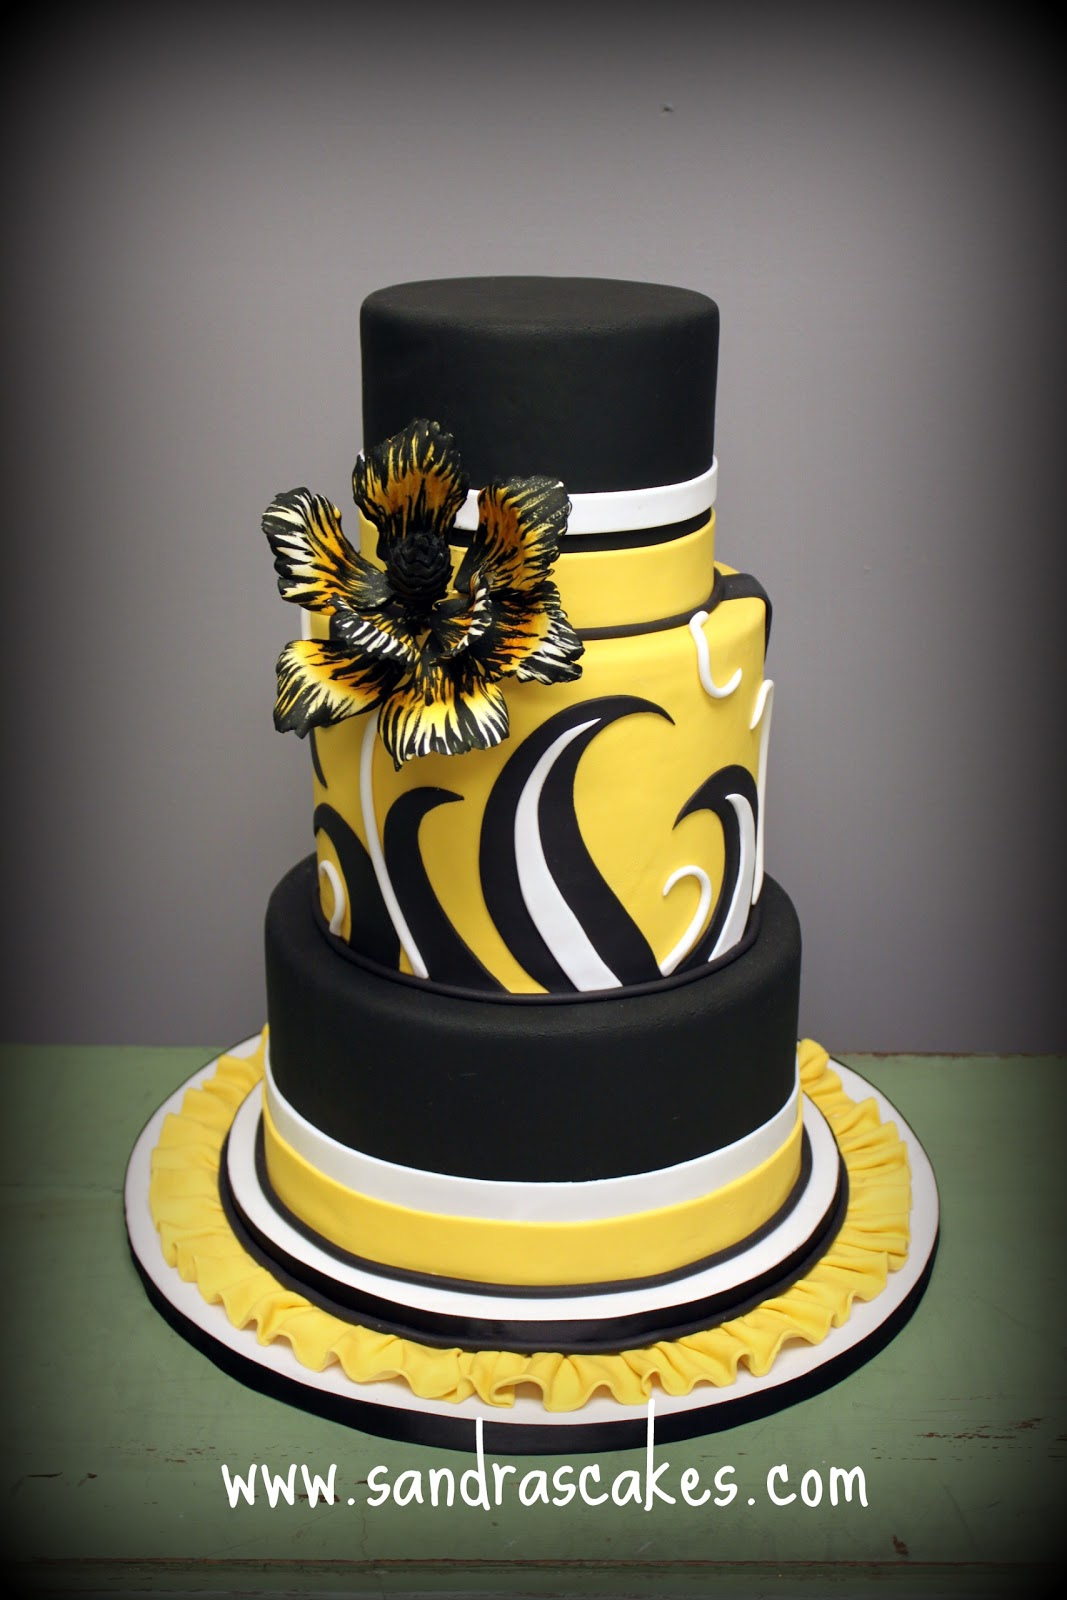 On Birthday Cakes Black And Yellow Wedding Cake